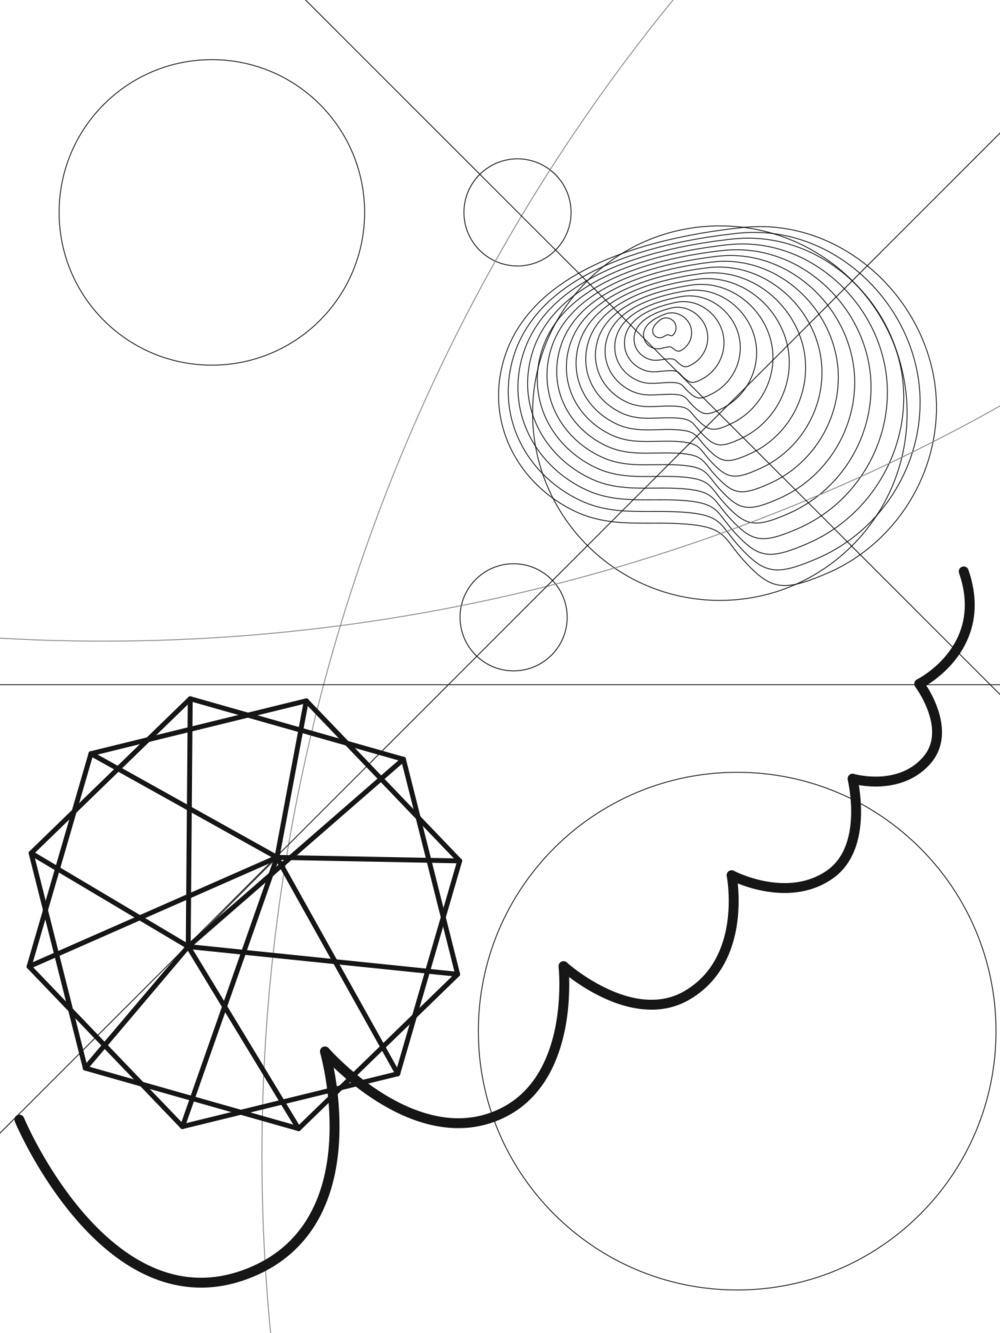 au-artcrank16-sketch4.jpg